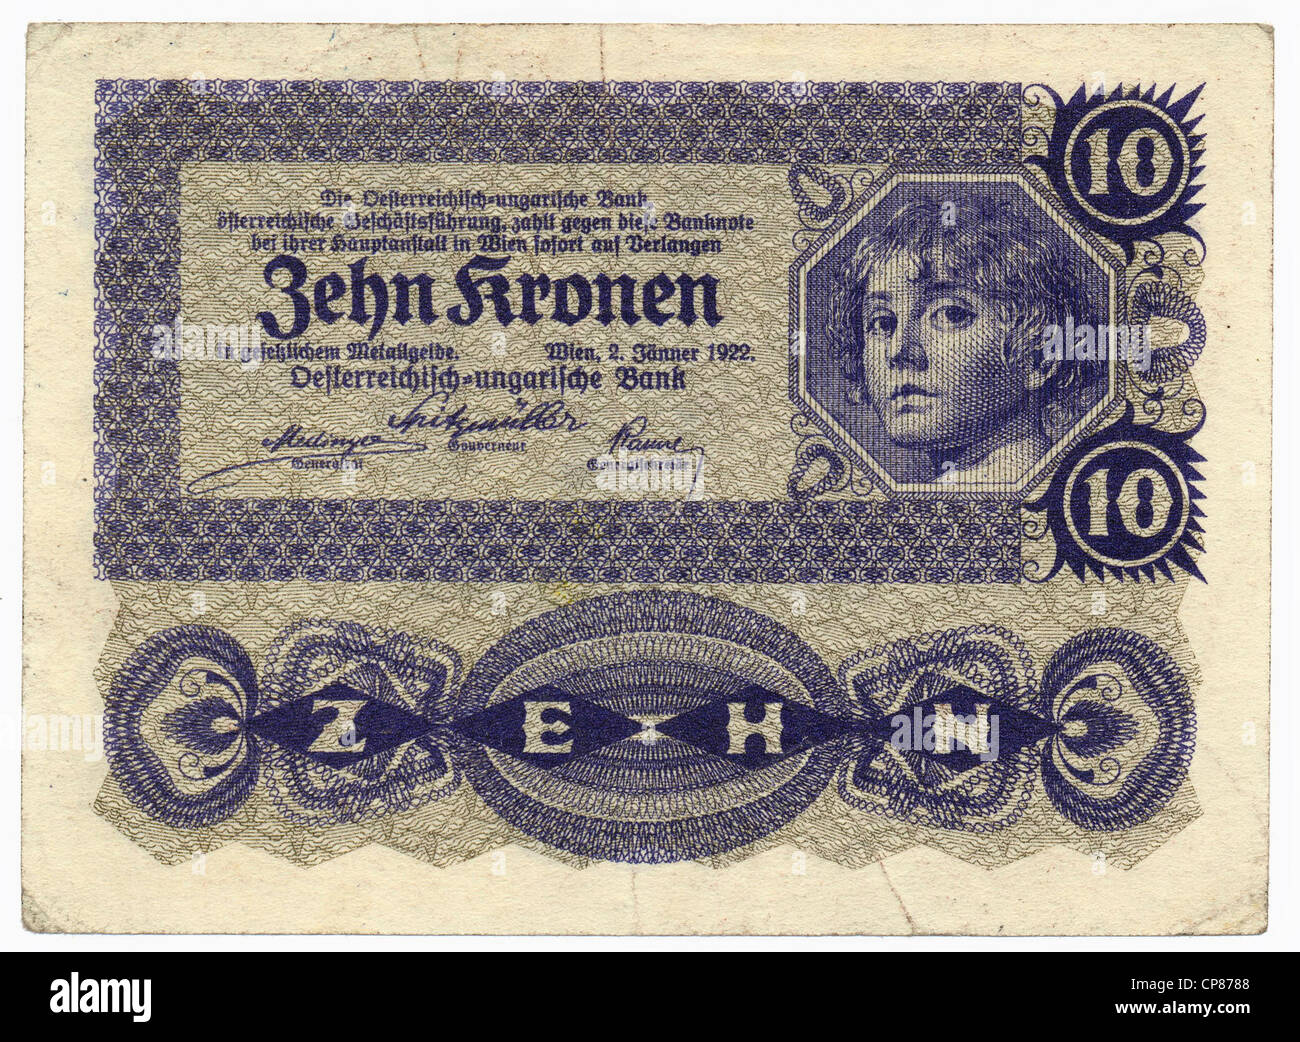 Historic banknote, Austria, Austro-Hungarian Bank, 10 koronas - Stock Image